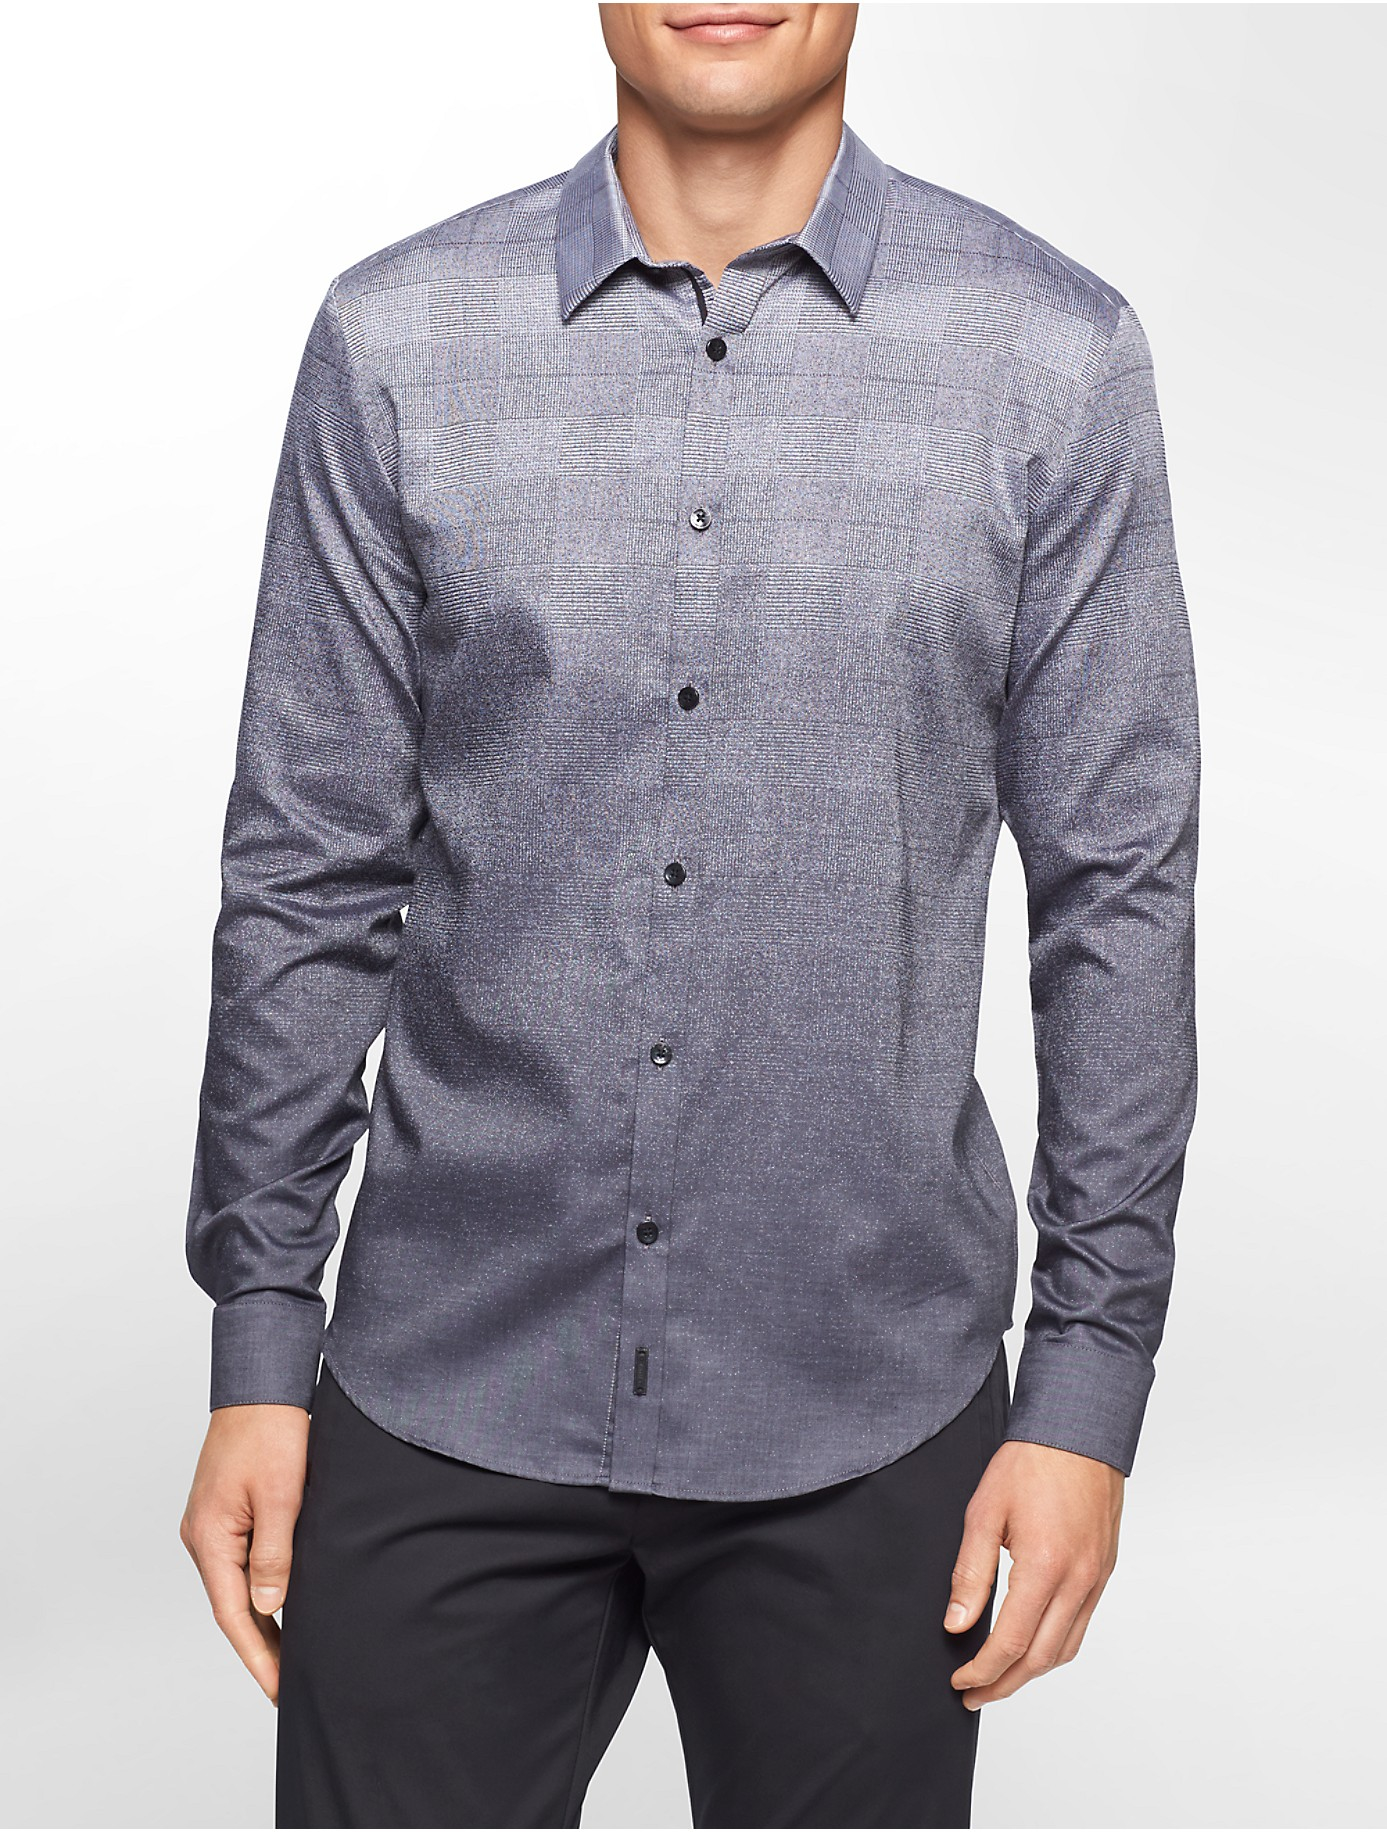 Calvin Klein Premium Slim Fit Ombre Plaid Shirt In Gray